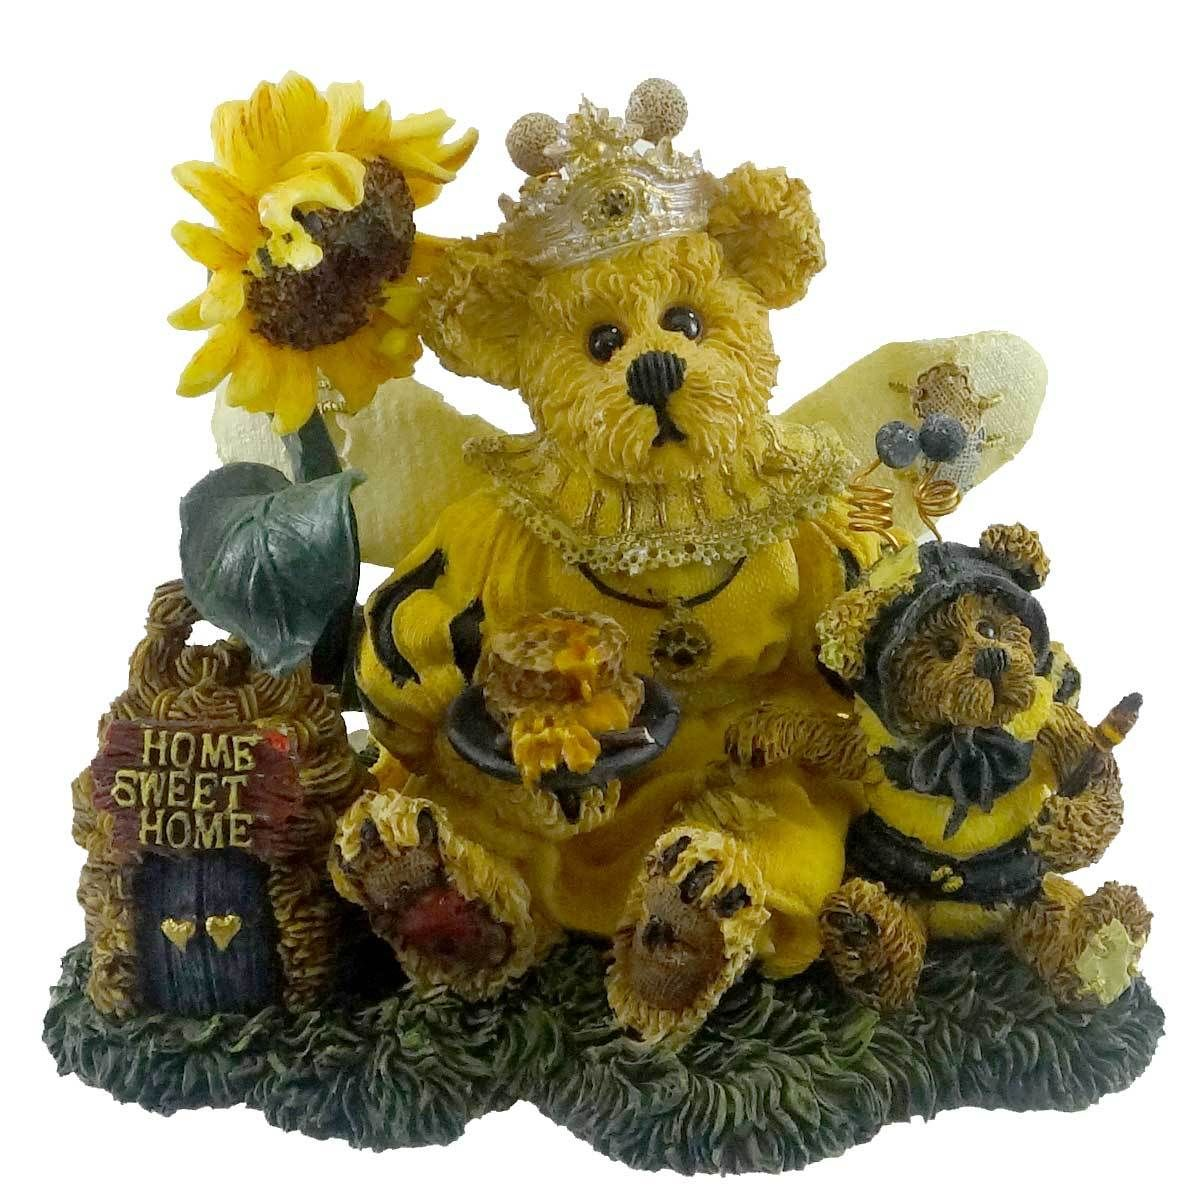 Boyds Bears Resin Victoria Regina Buzzbruin Figurine